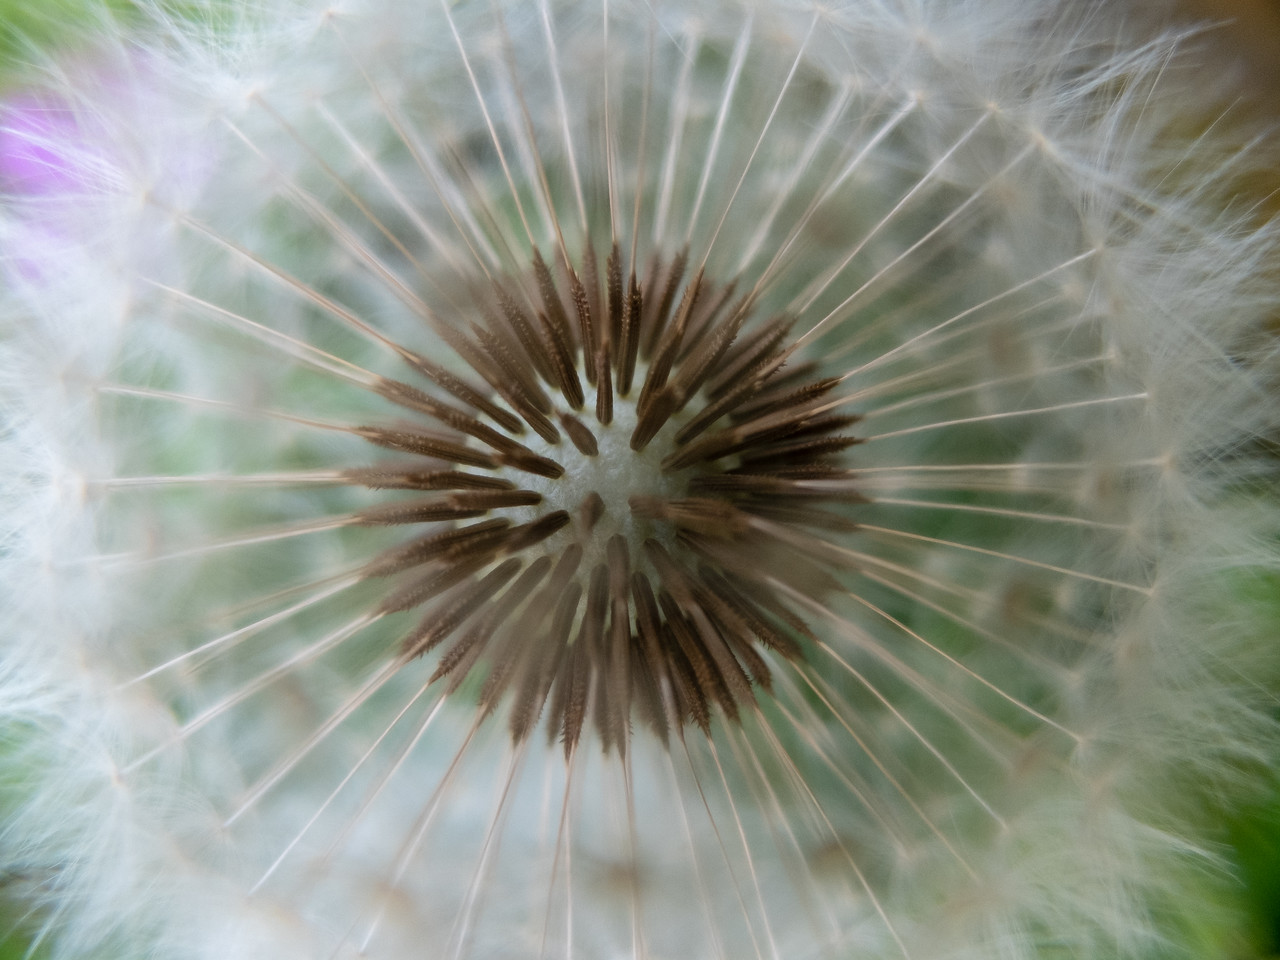 Eye of the Dandelion